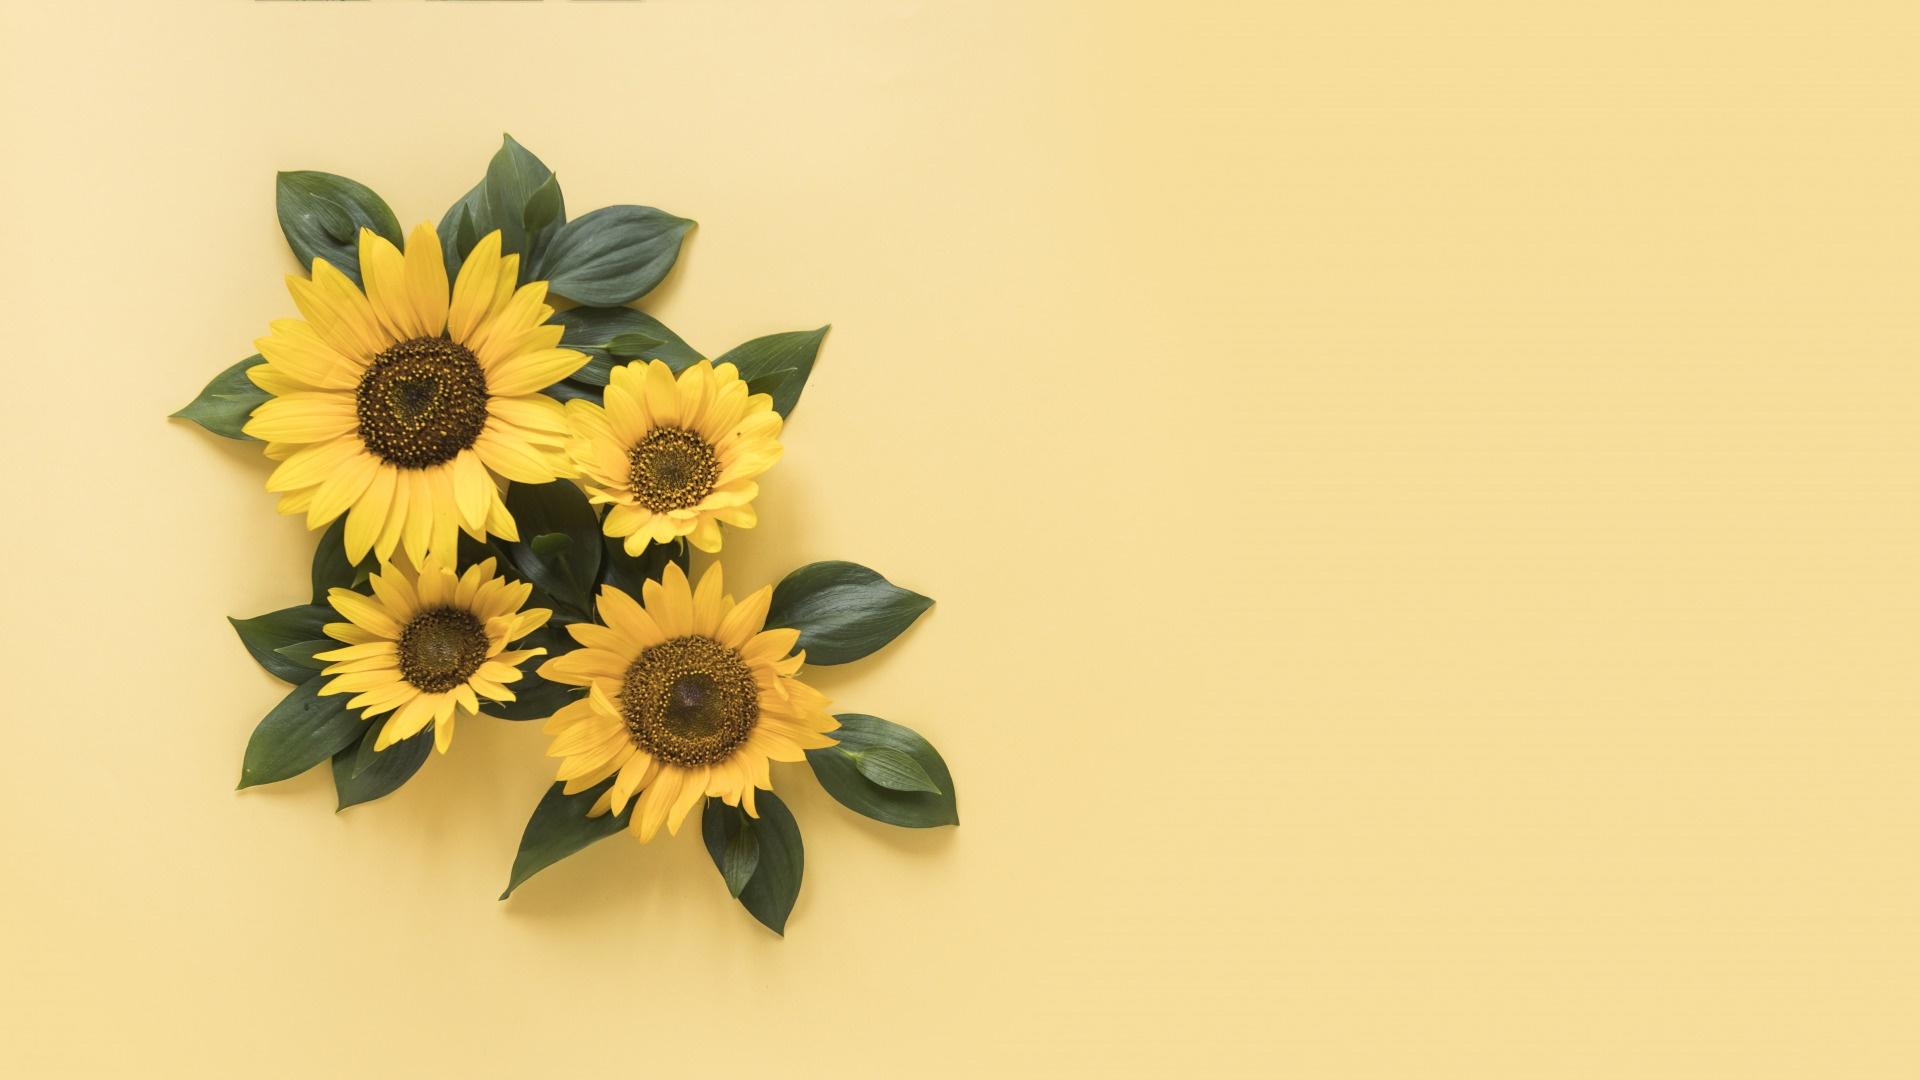 Sunflower pc wallpaper